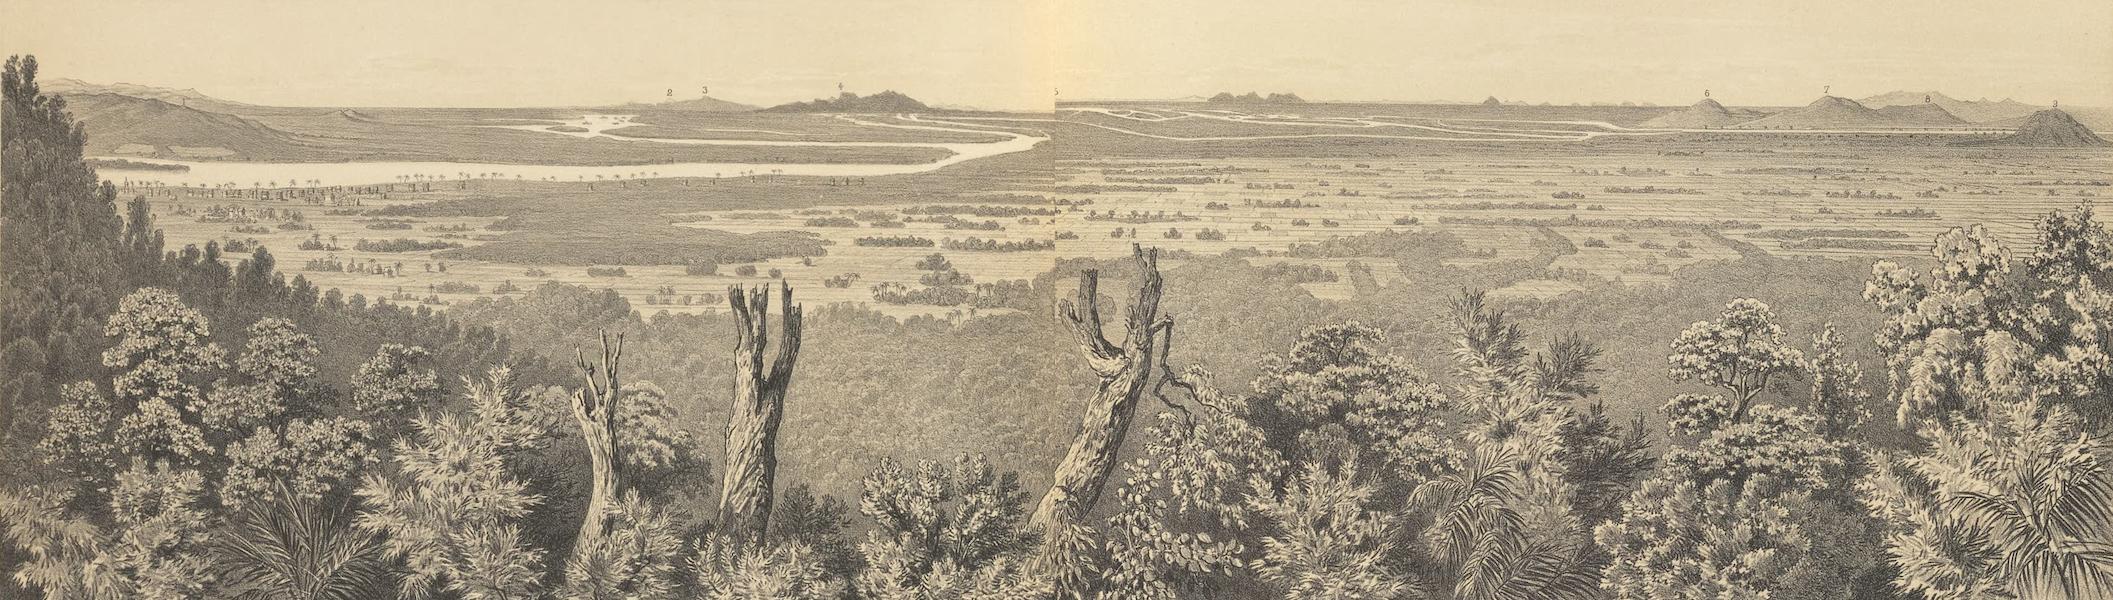 Panorama du Groupe d'Iles de Khong (Pris du Sommet de Phou Hin Khong)